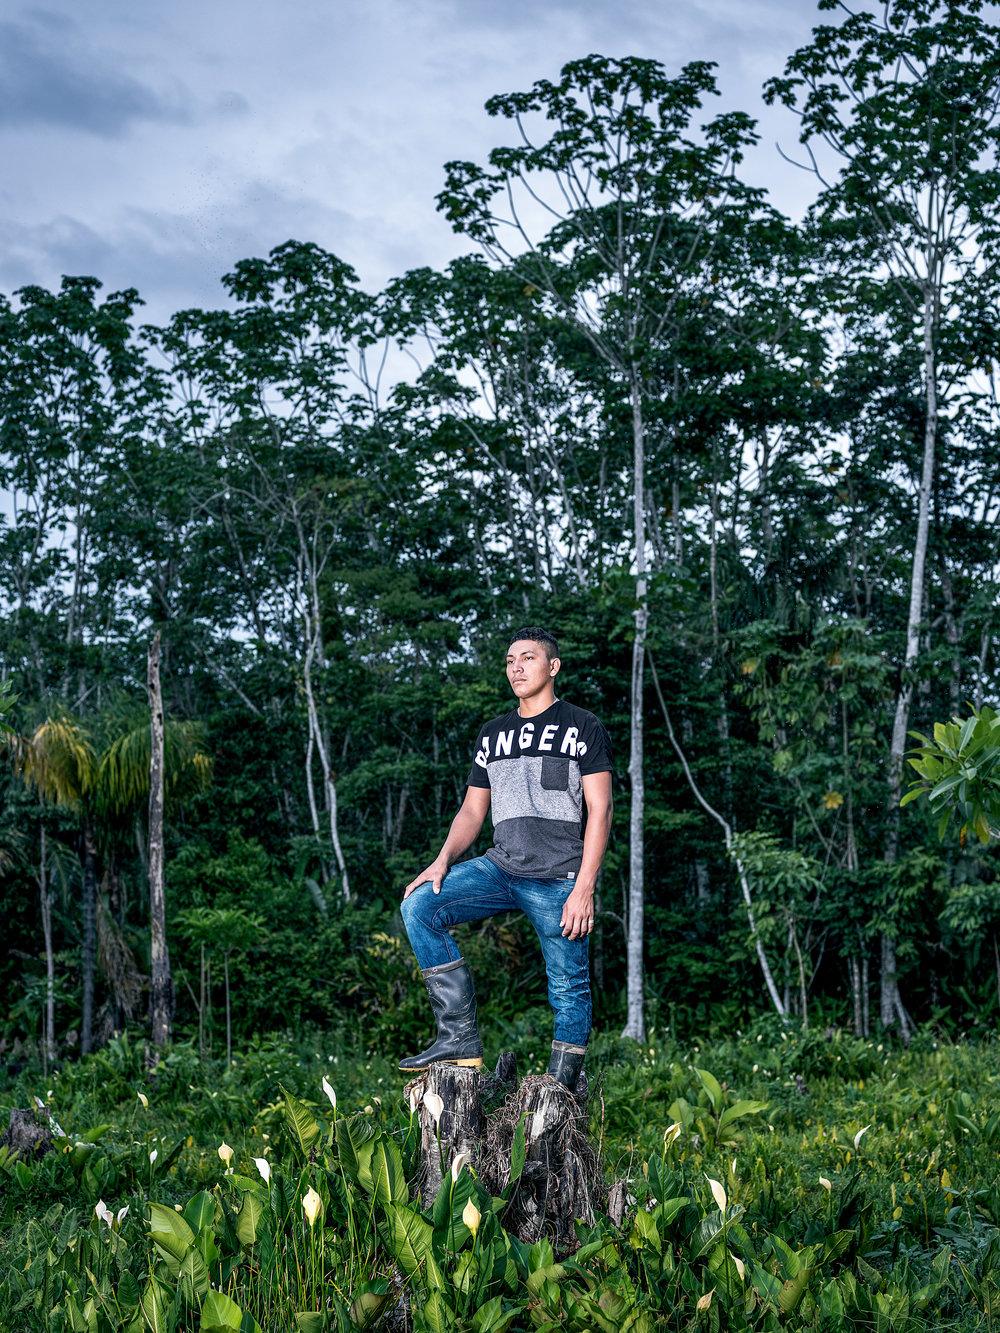 Ramón Bedoya 2018 ©thom pierce / Guardian / UN Environment / Global Witness